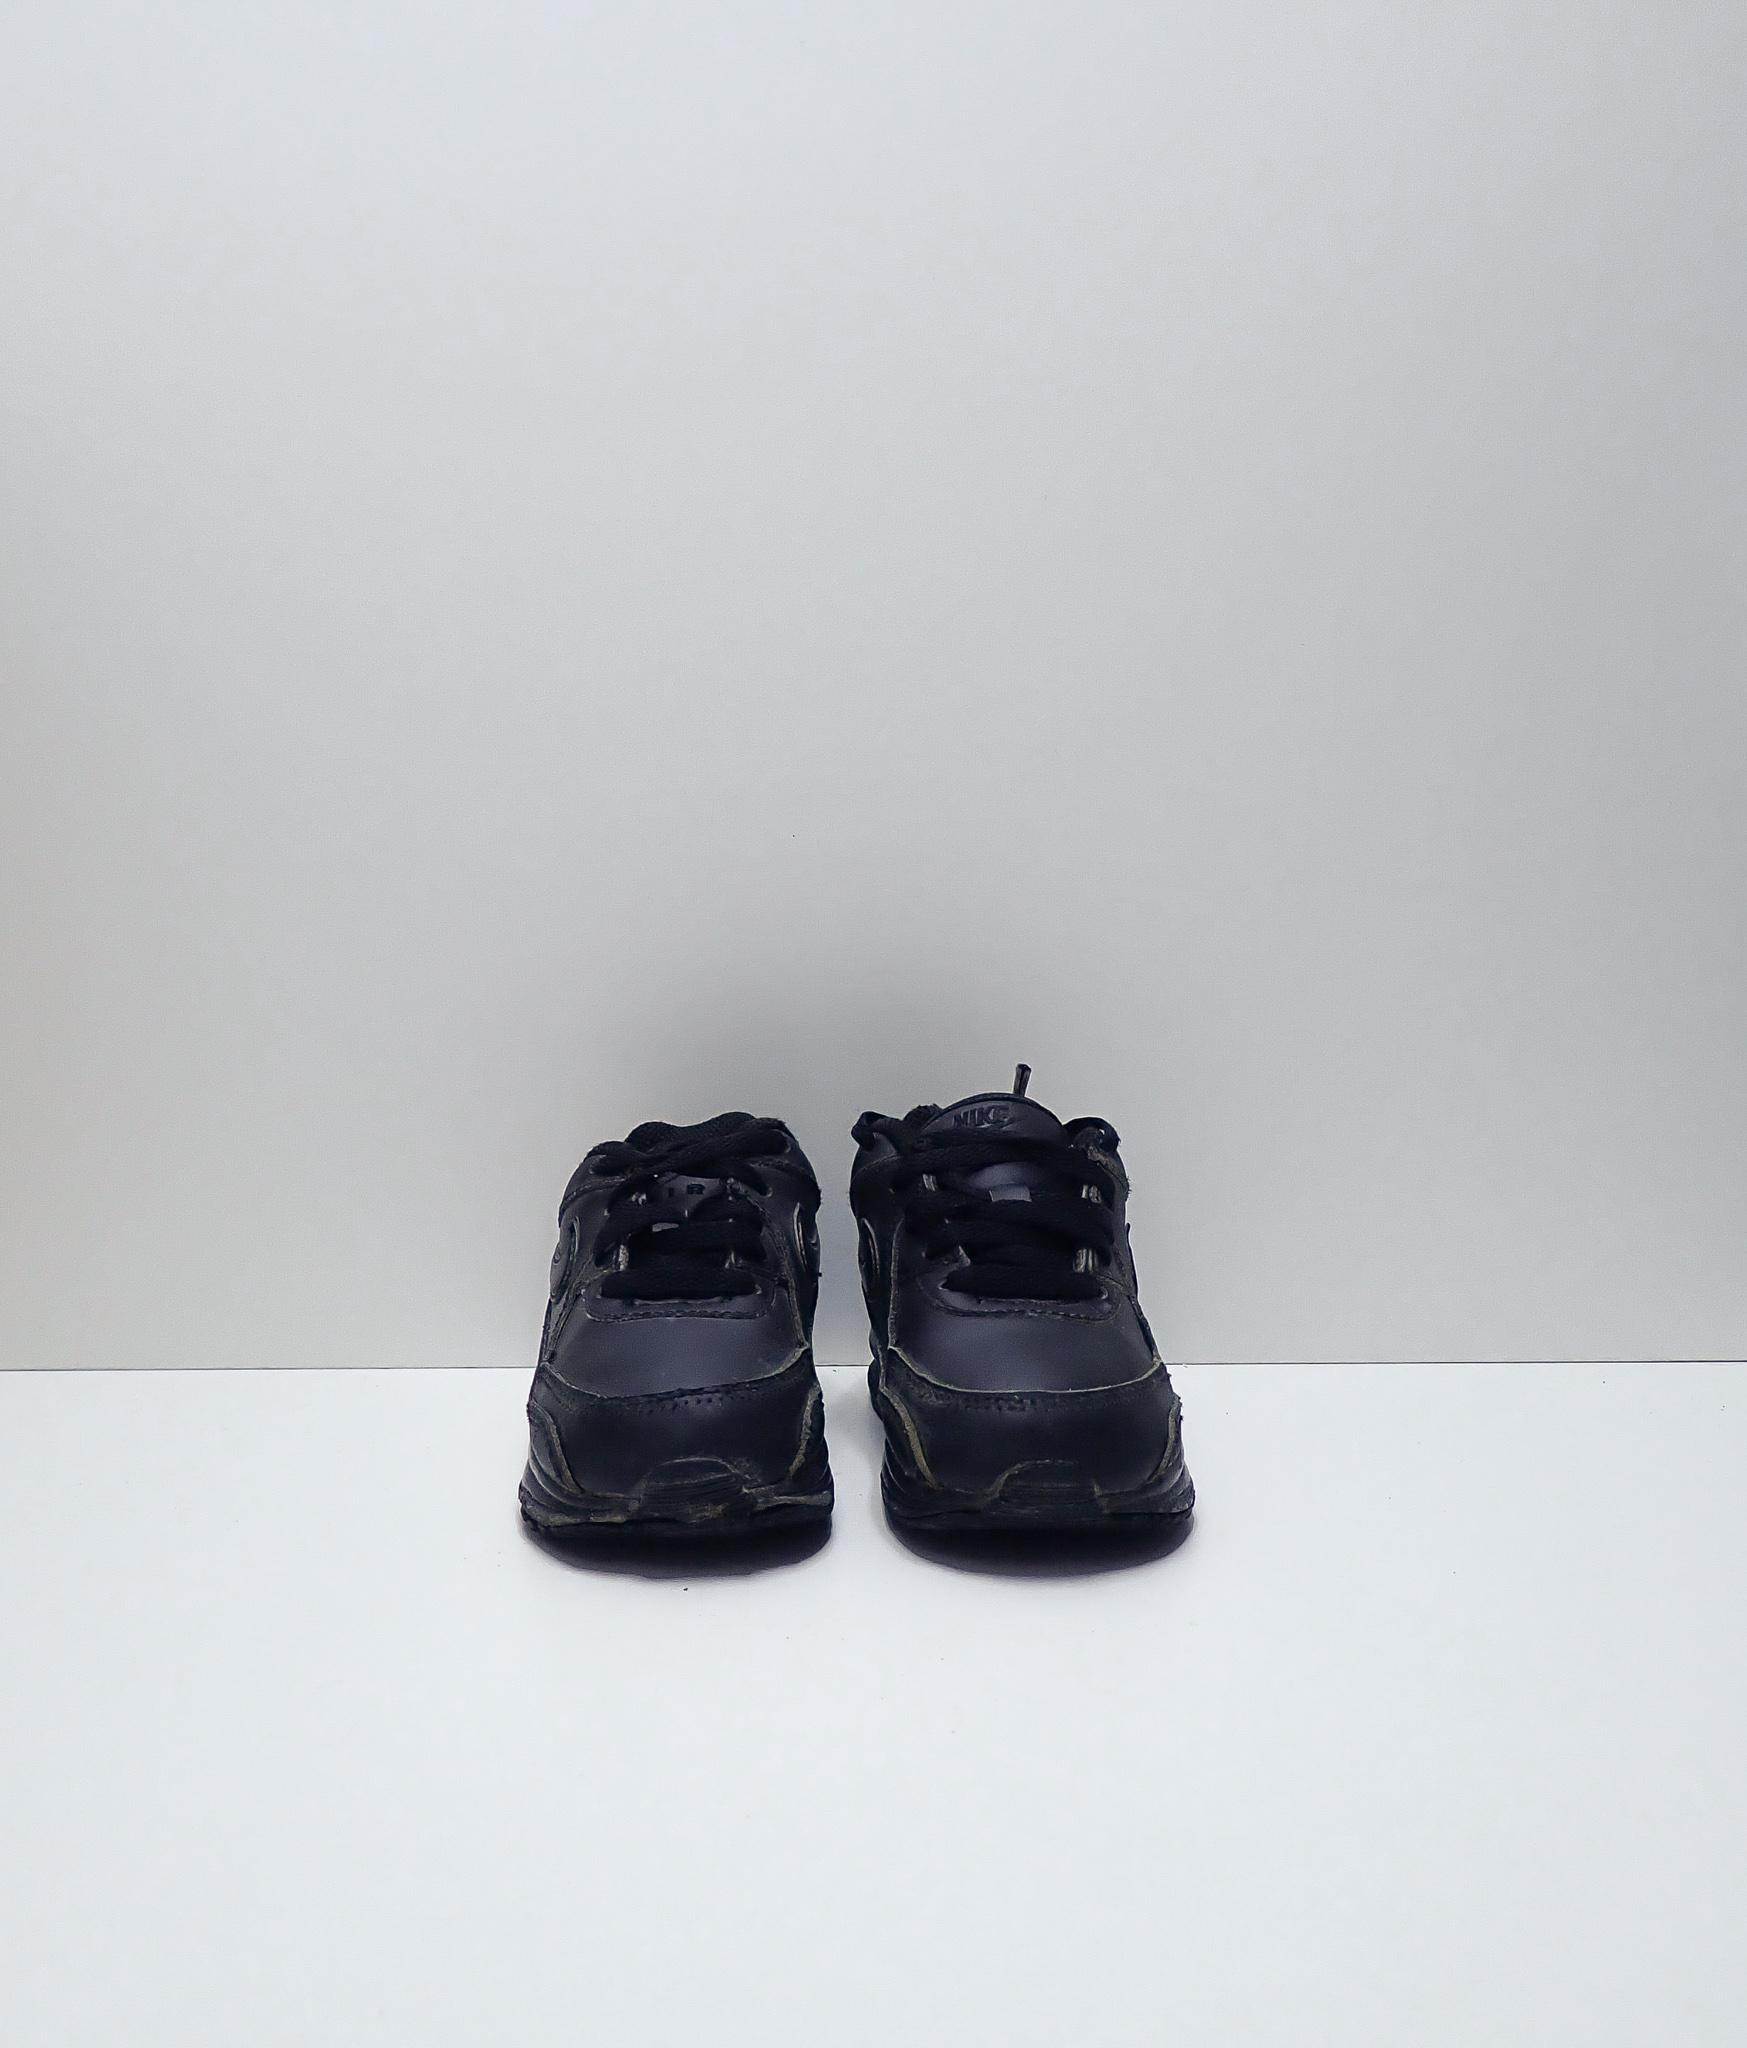 Nike Air Max Wright LTD Toddler